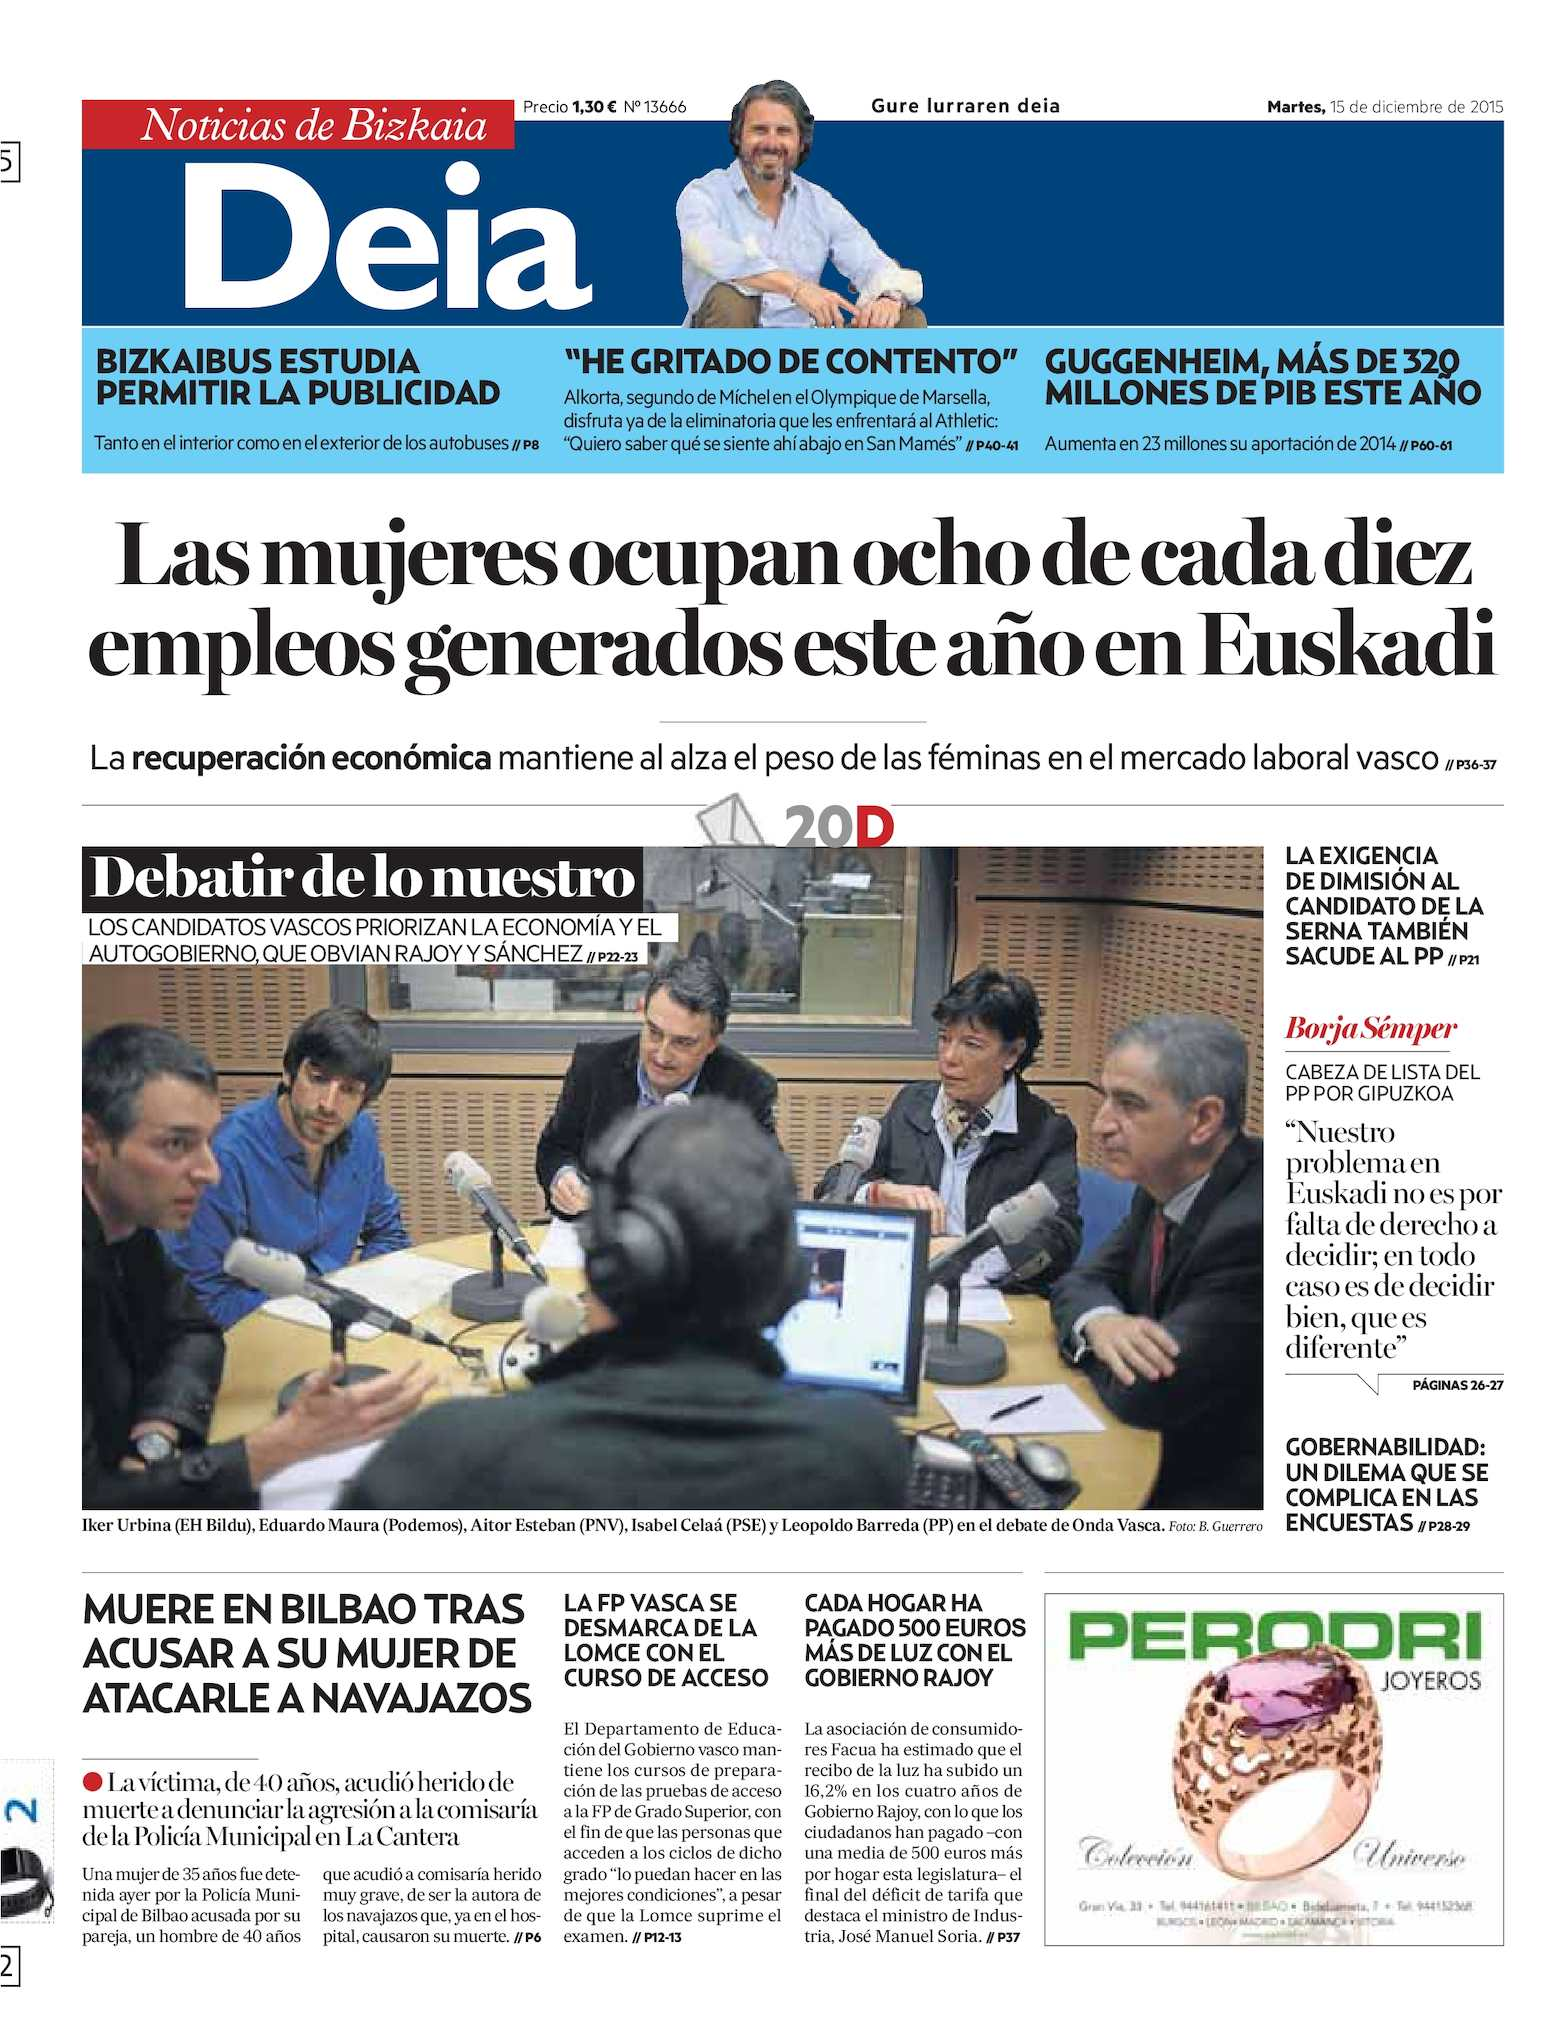 Calaméo - Deia 20151215 6bca666ec00